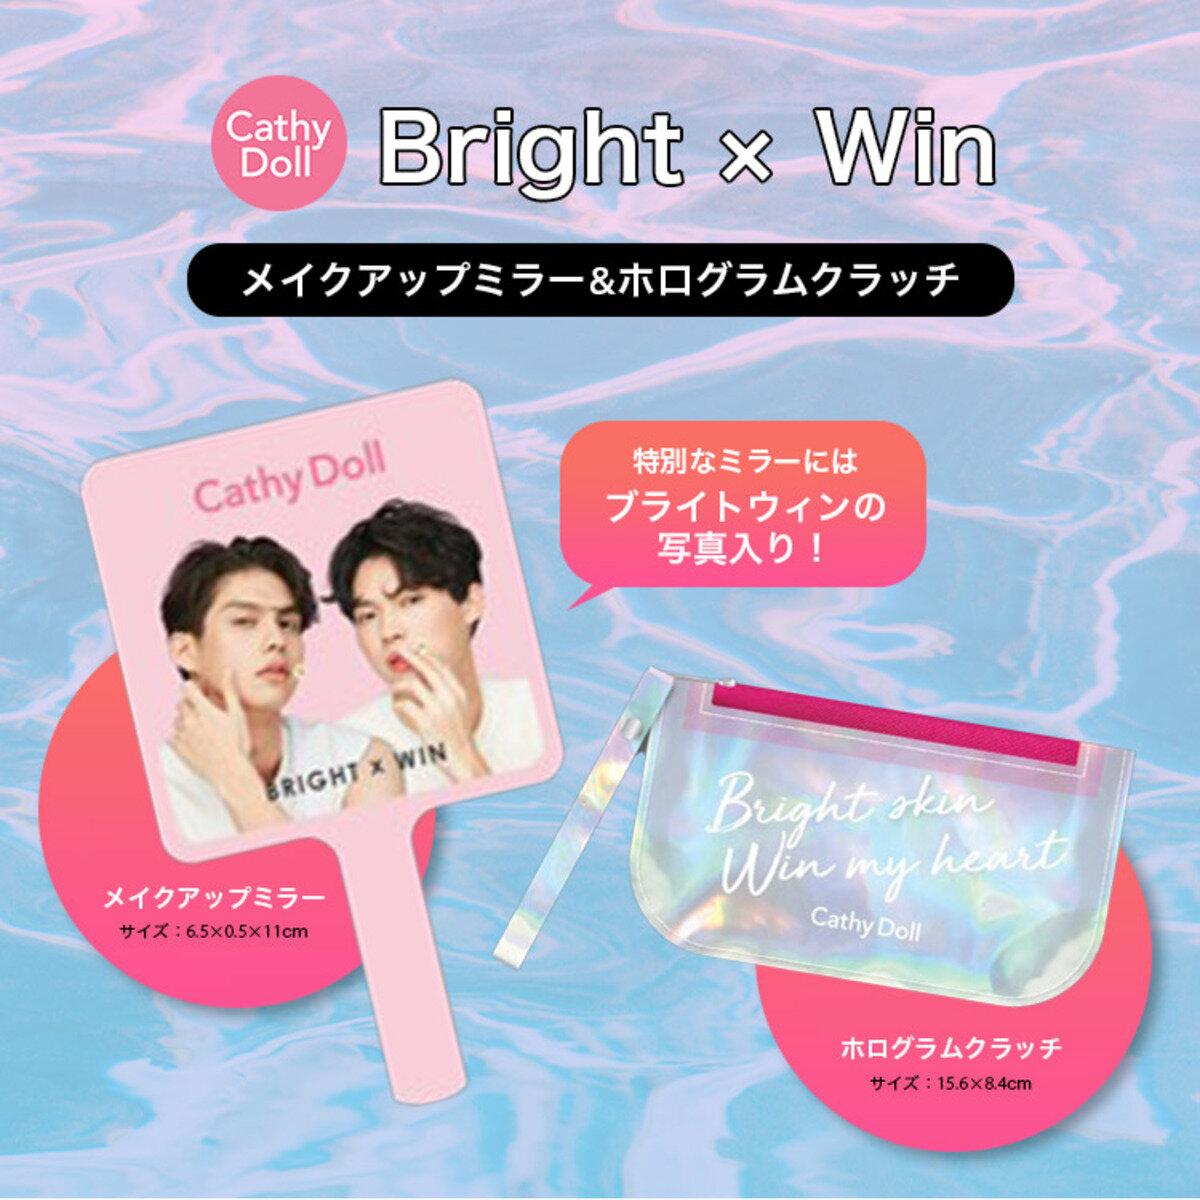 CathyDoll プレミアムセット Bright-Win